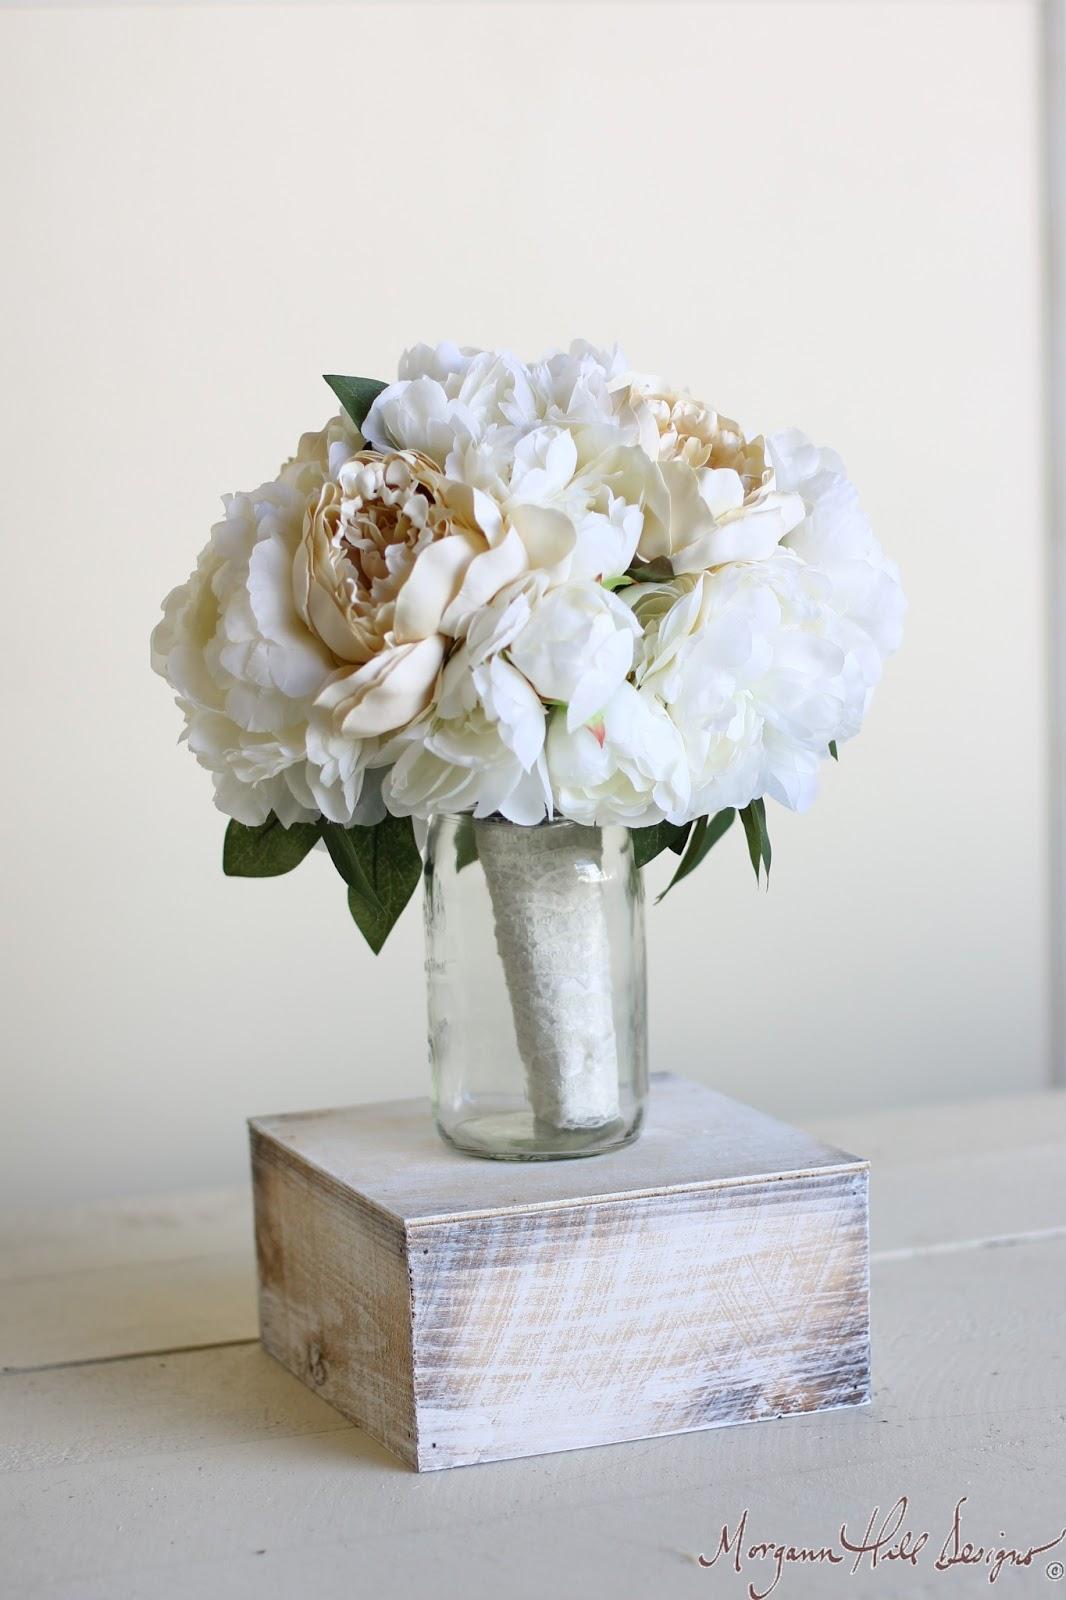 Morgann Hill Designs: Barn Wood Planter Box Wedding Centerpiece ...